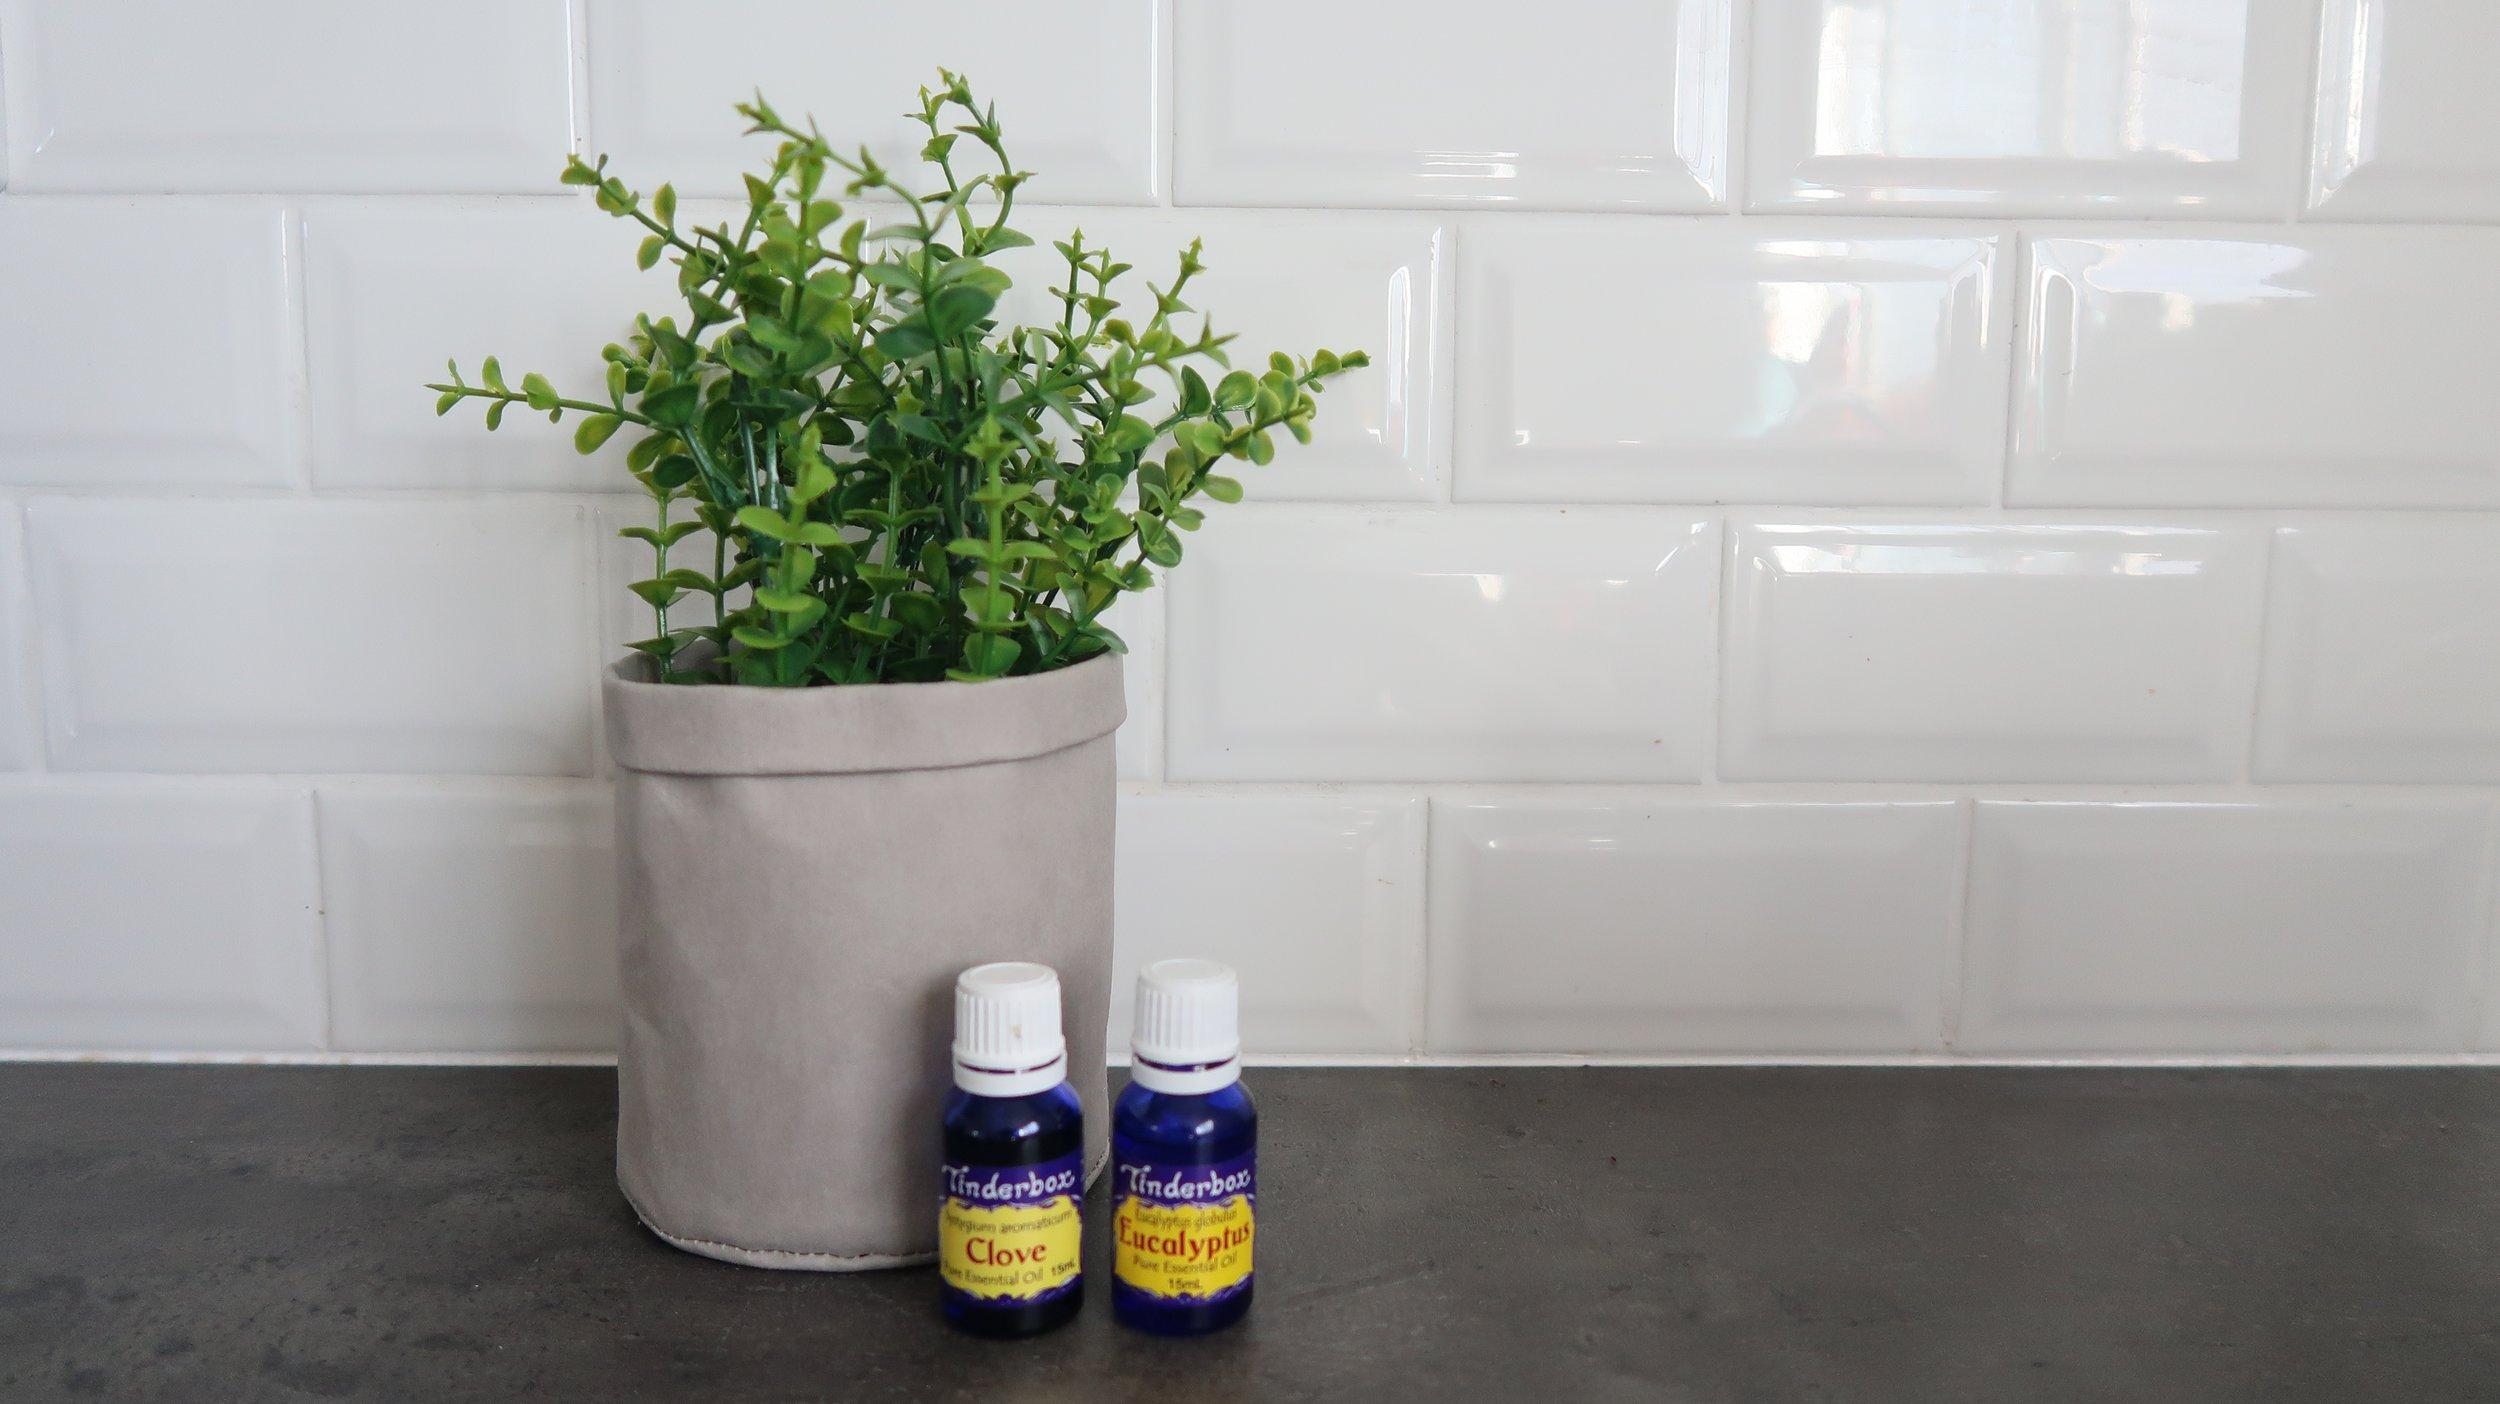 tinderbox-essential-oils.jpg